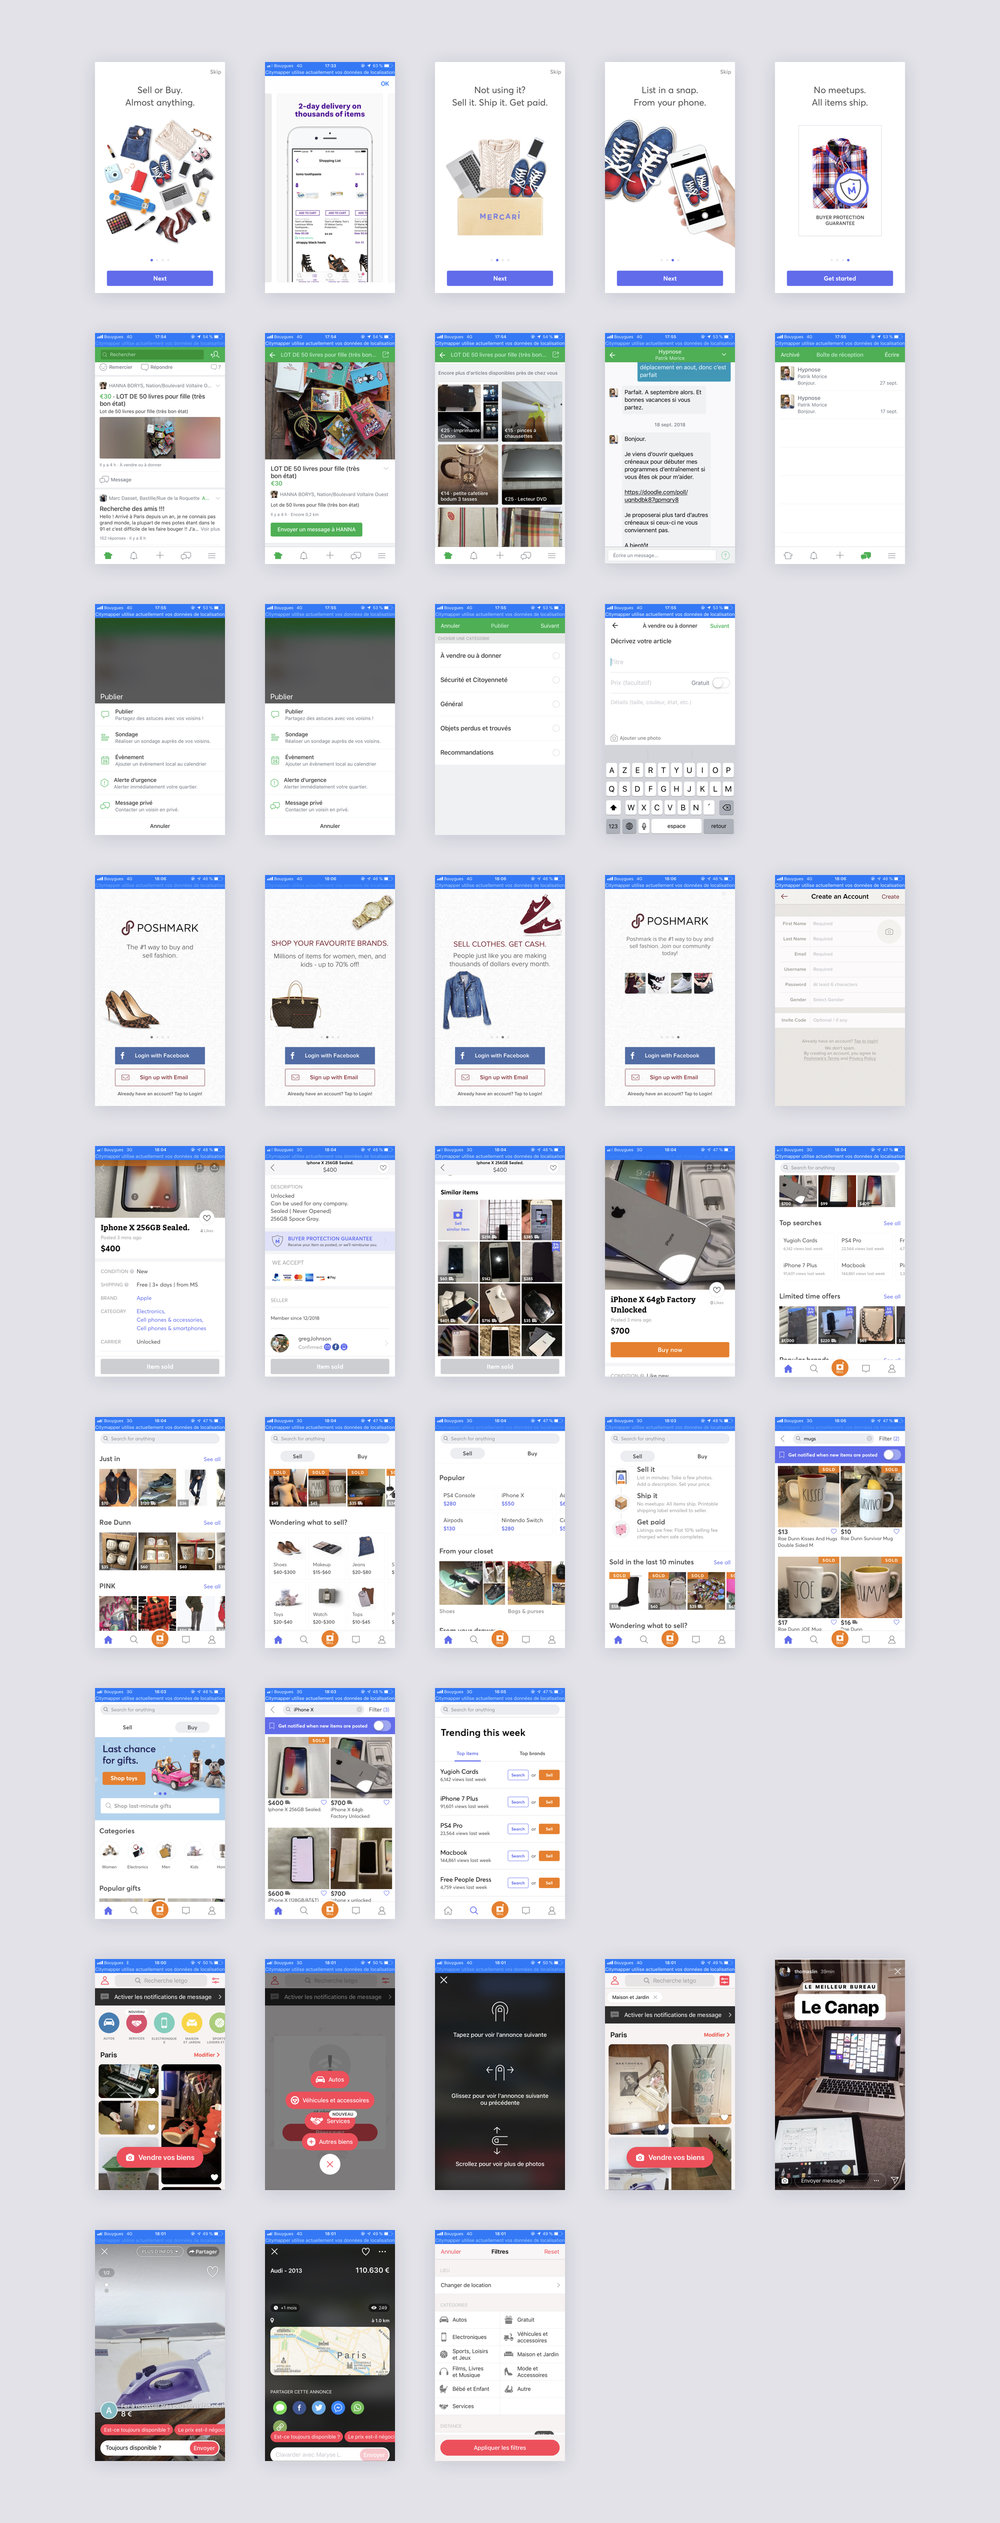 Selected apps: Nextdoor, letgo, Marcari, GDC, OfferUp, Facebook Marketplace, Poshmark, The Realreal, Leboncoin, Instagram…